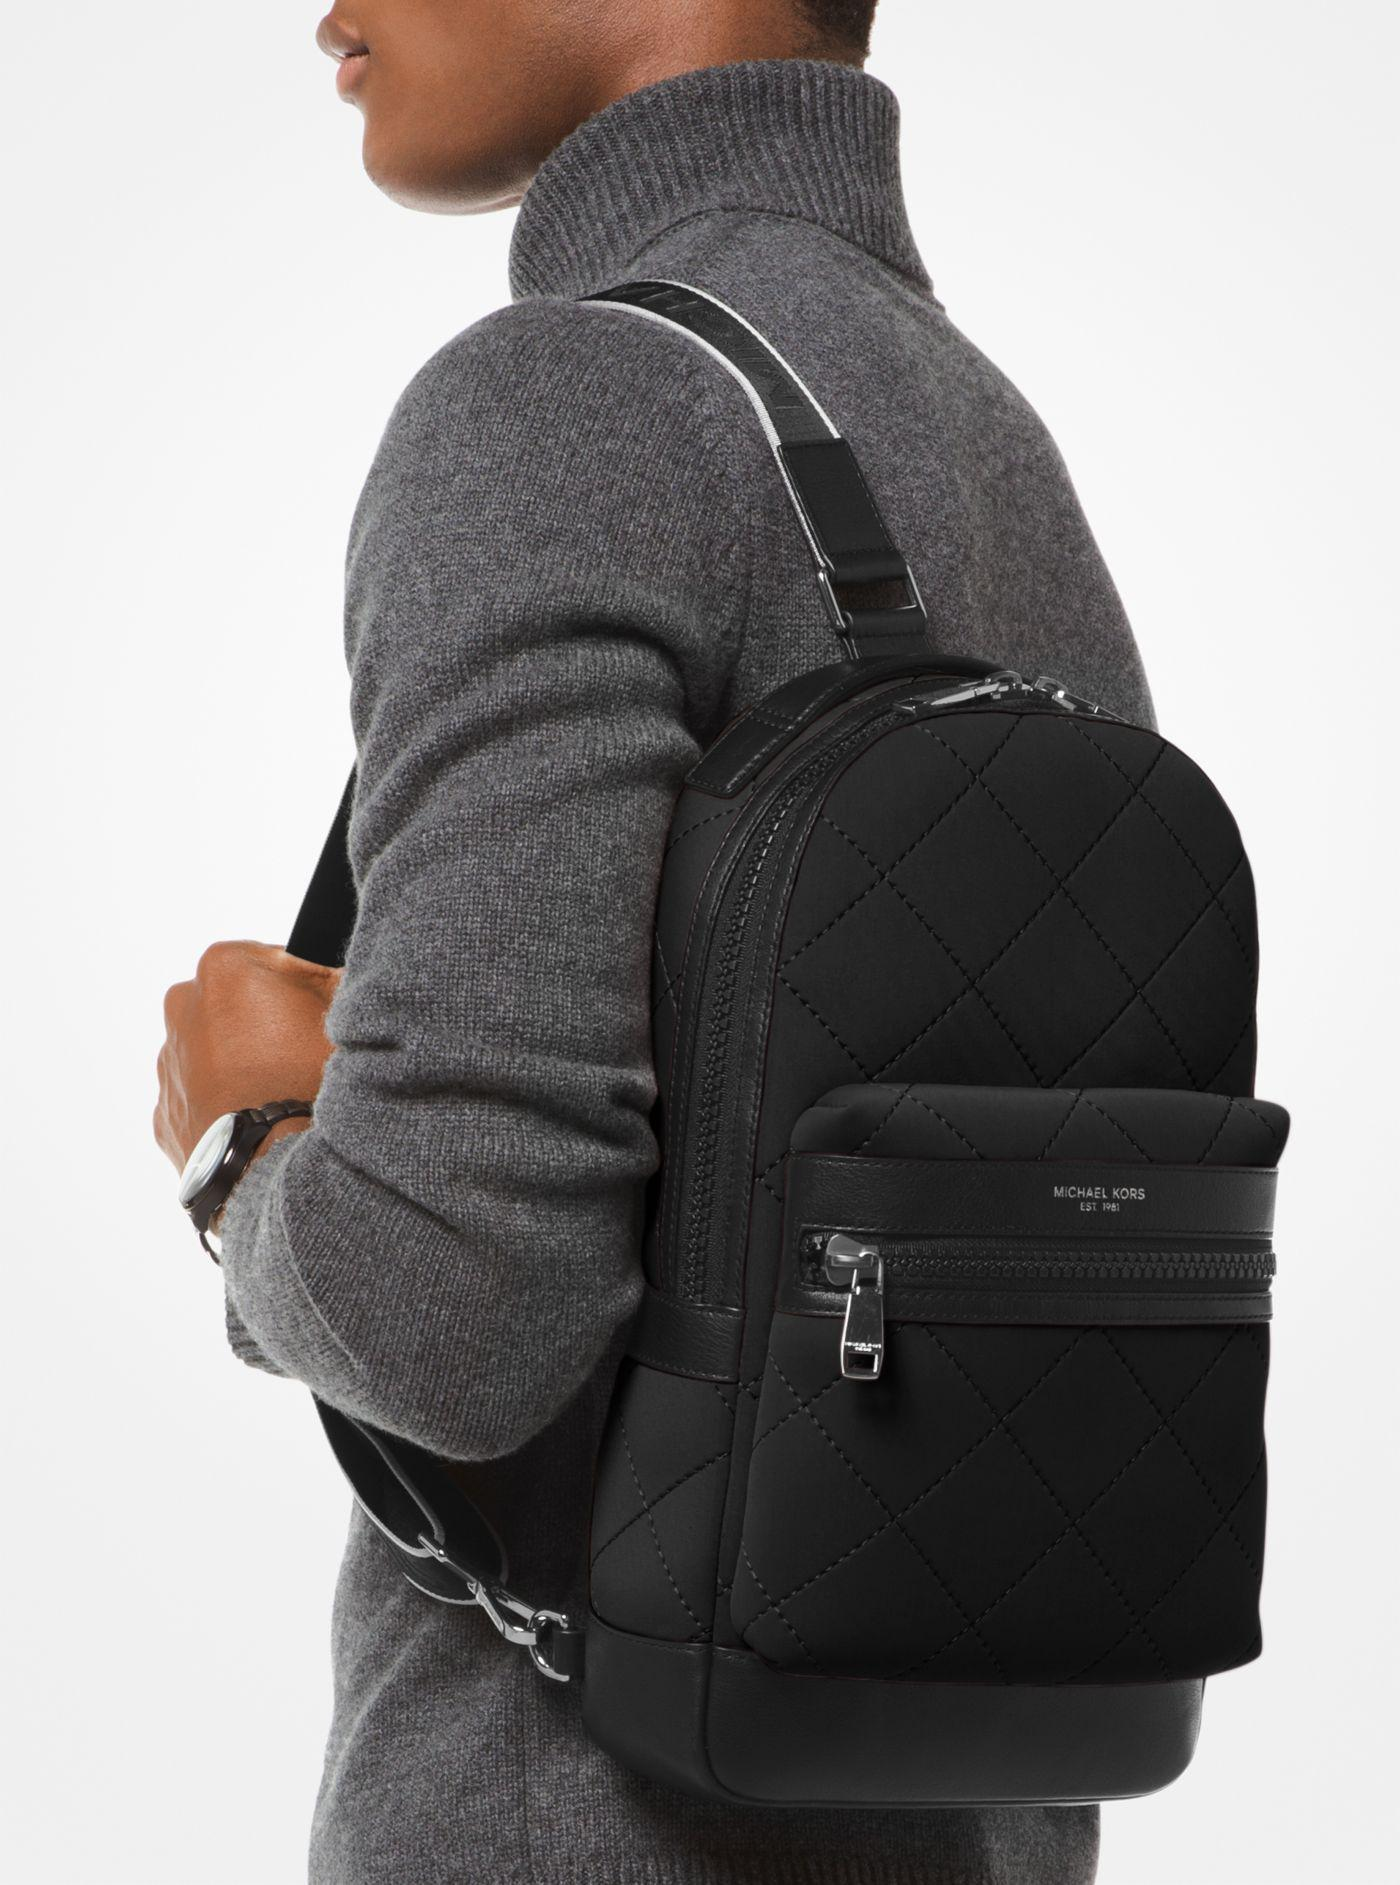 8513a143a33d Michael Kors Odin Large Quilted Neoprene Sling Pack in Black for Men ...